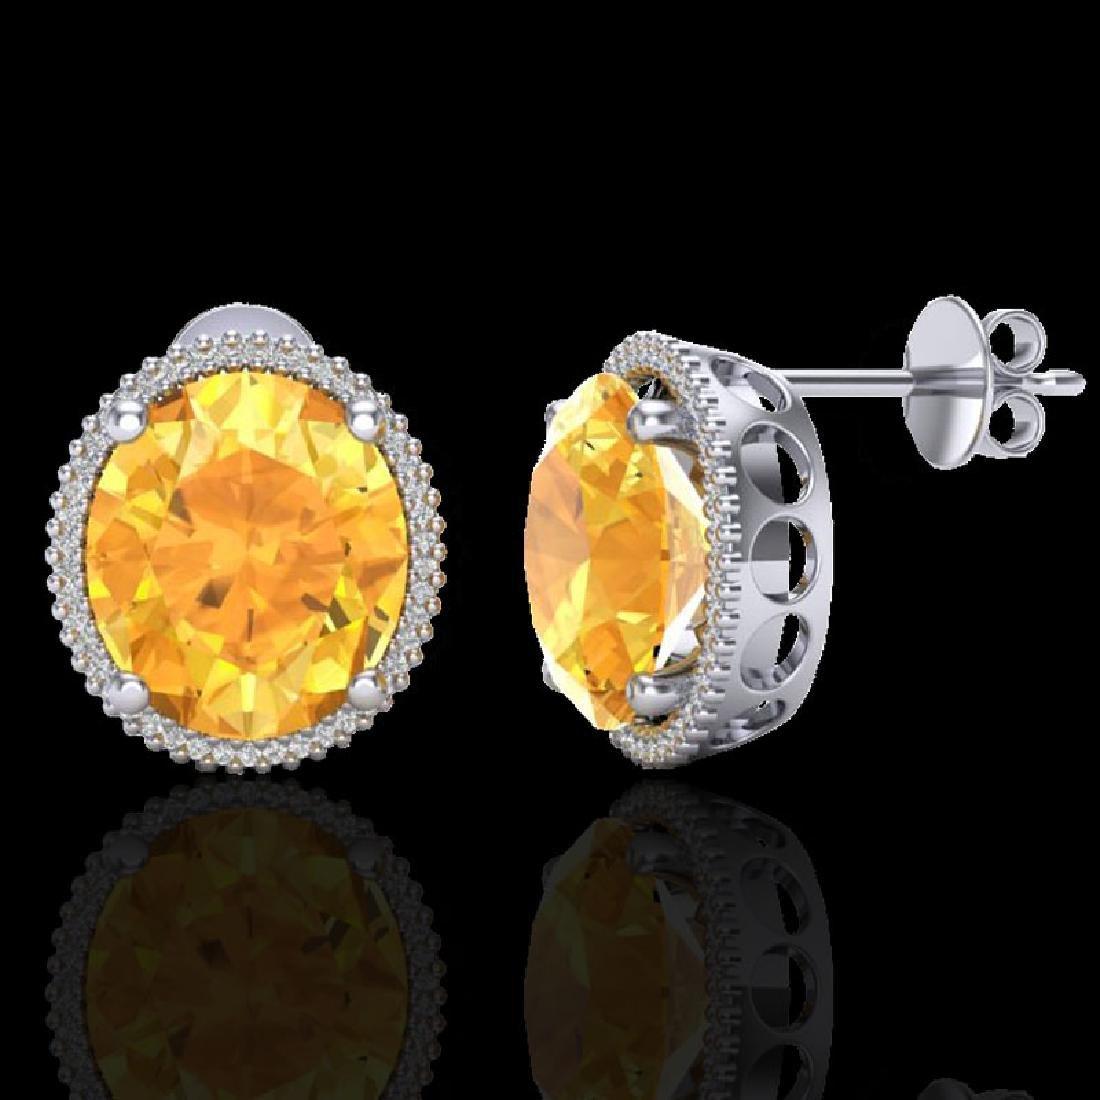 20 CTW Citrine & Micro Pave VS/SI Diamond Halo Earrings - 2